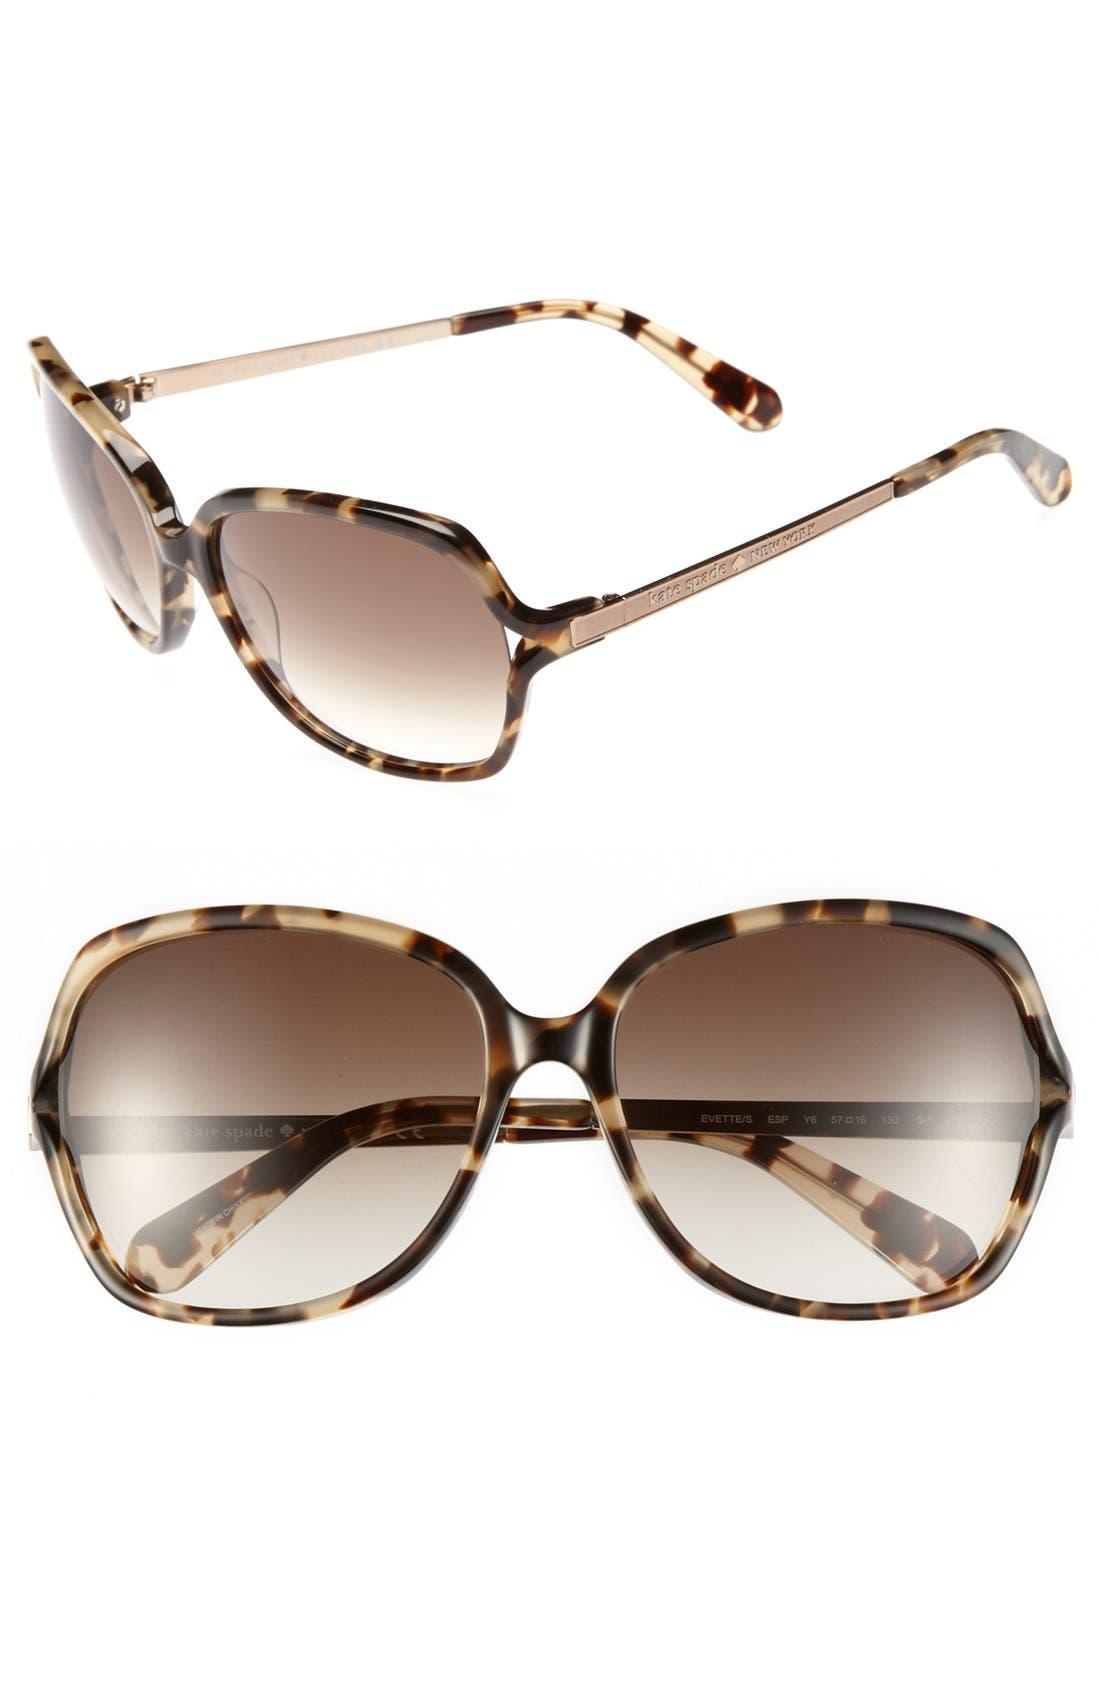 Main Image - kate spade new york 'evette' 57mm oversized sunglasses